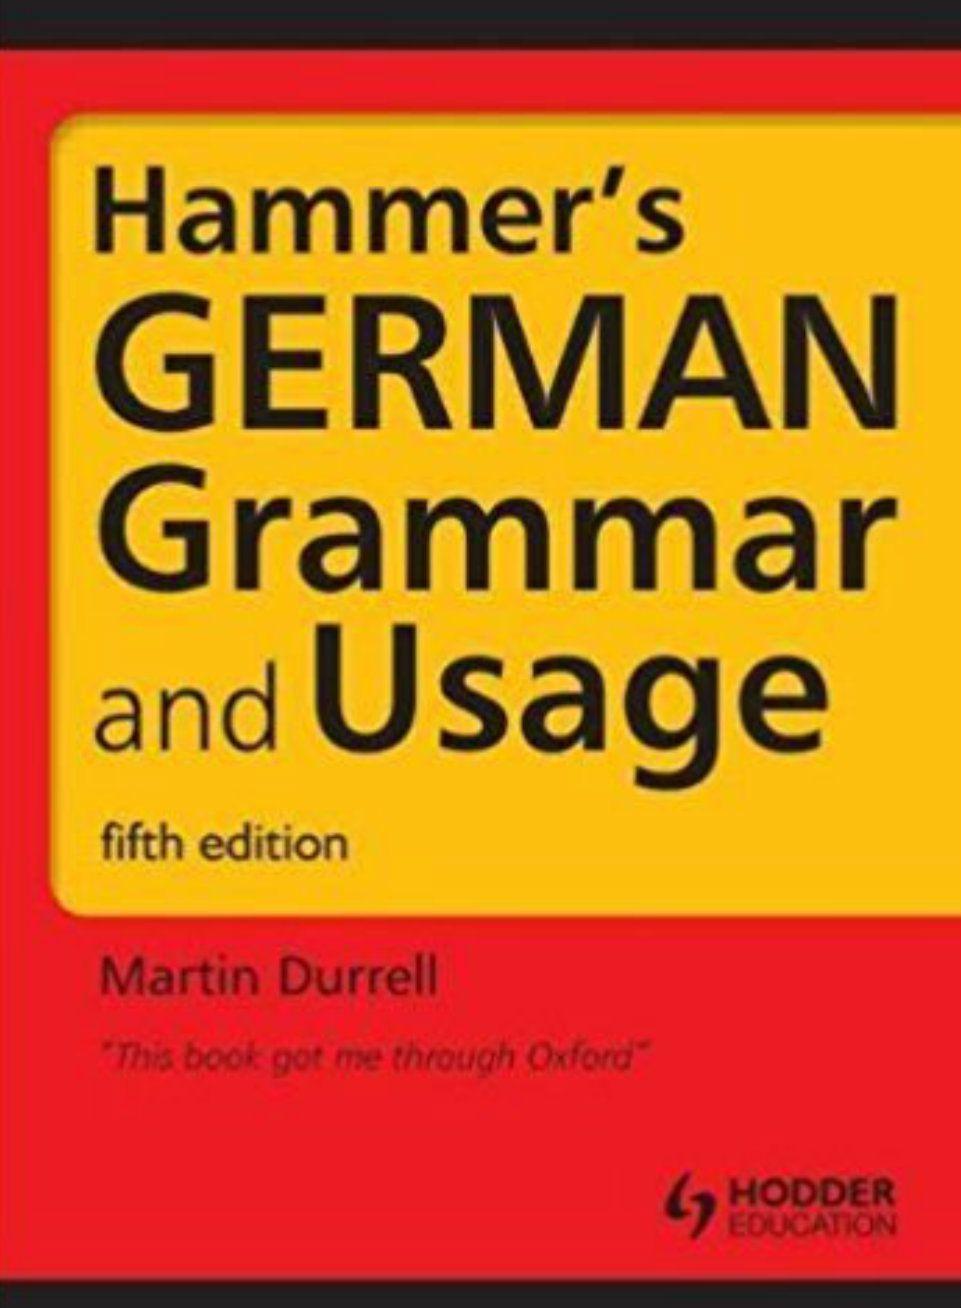 Advanced German lessons free & online: Learn German grammar